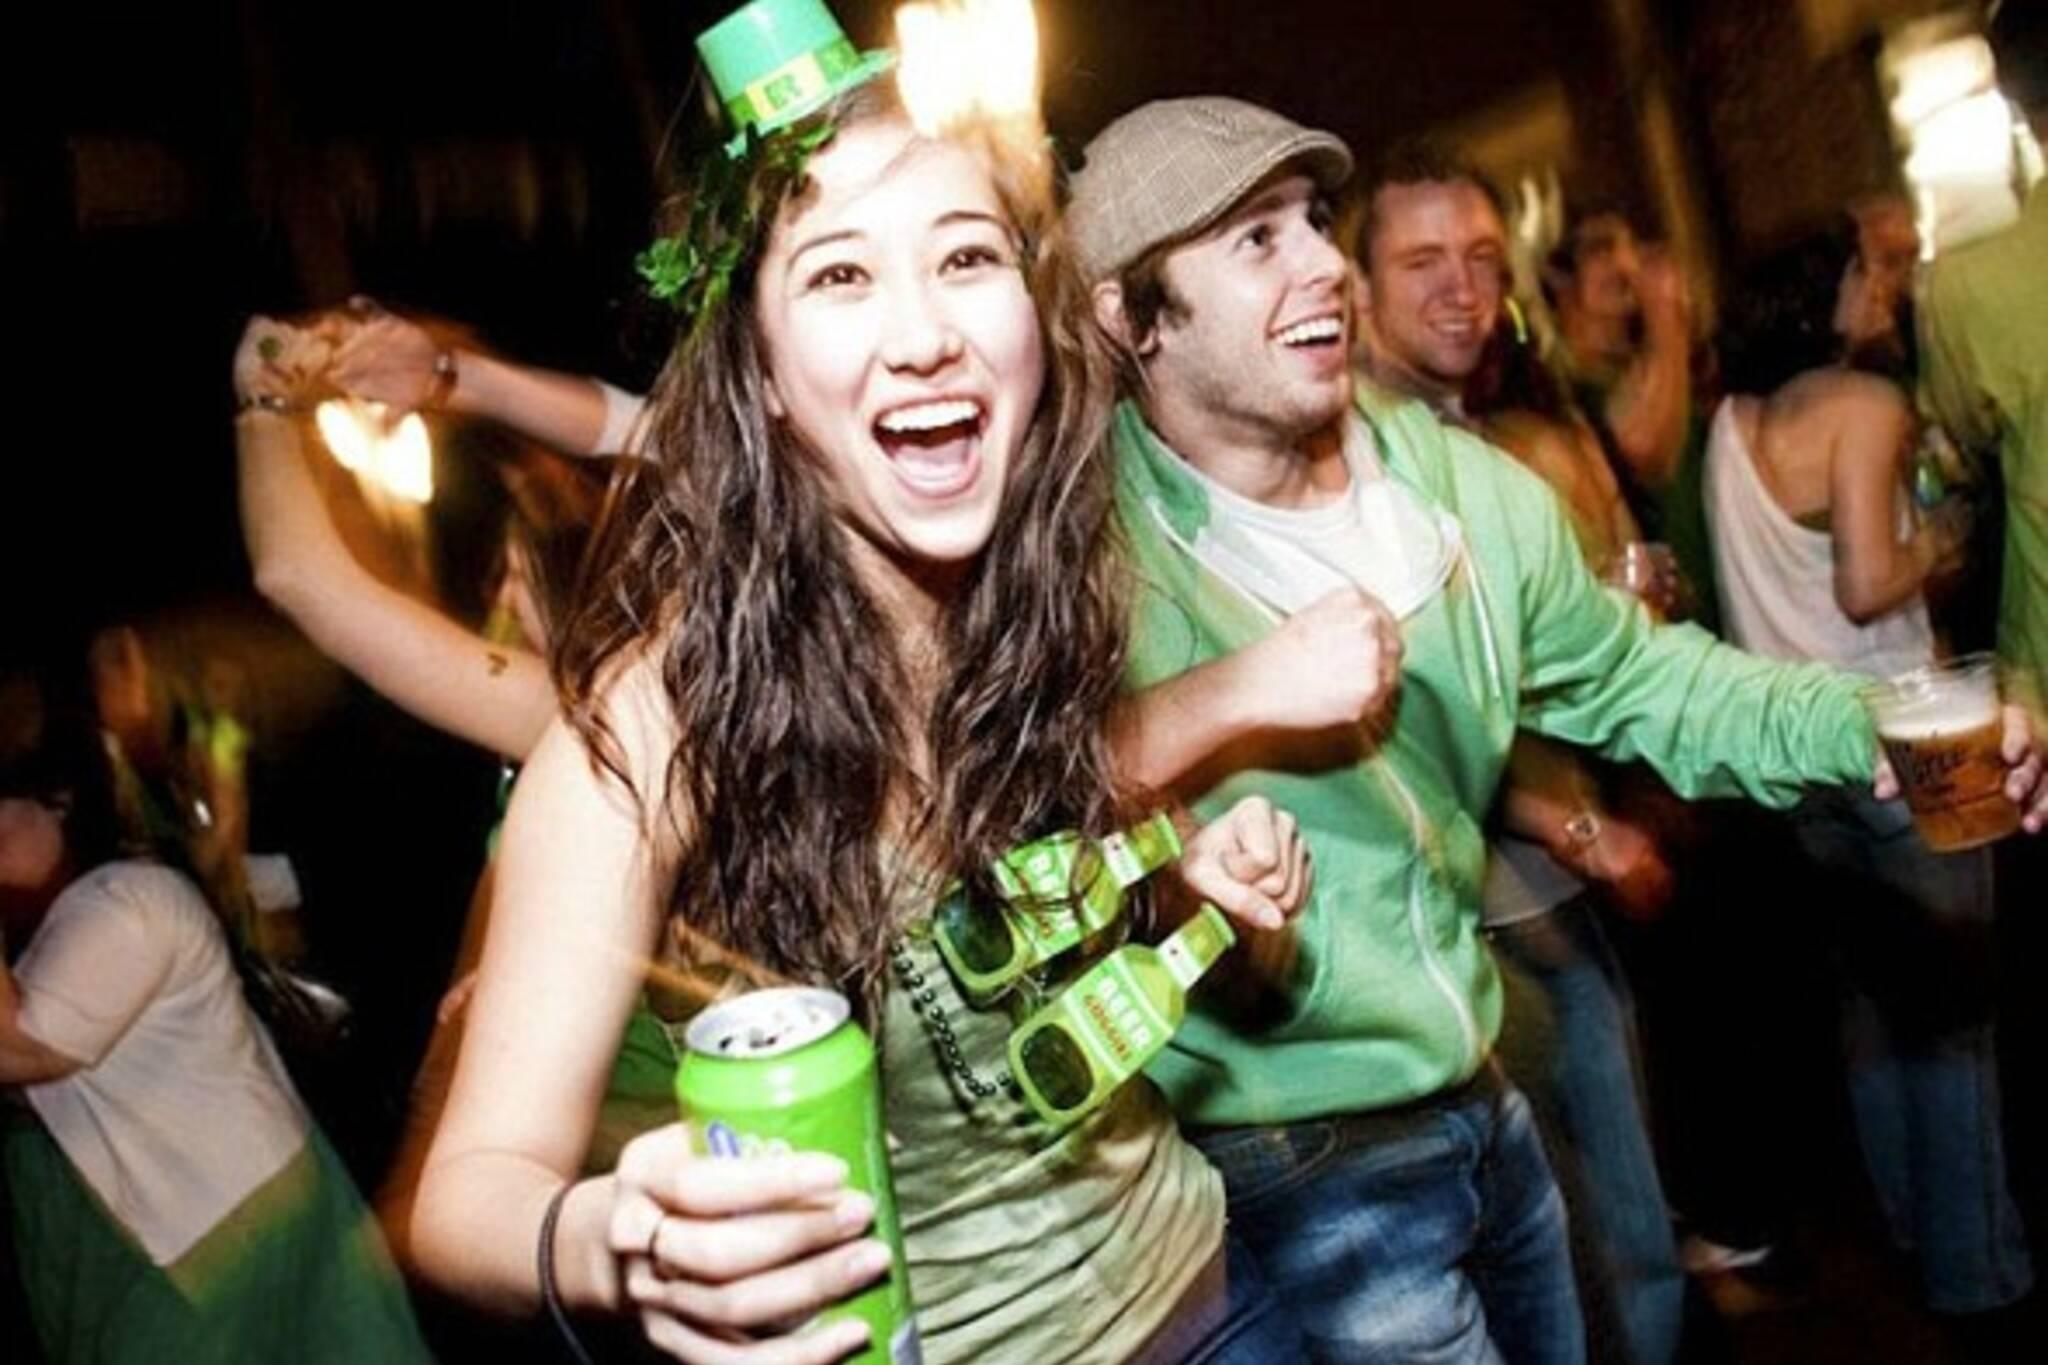 St. Patrick's Day Toronto events